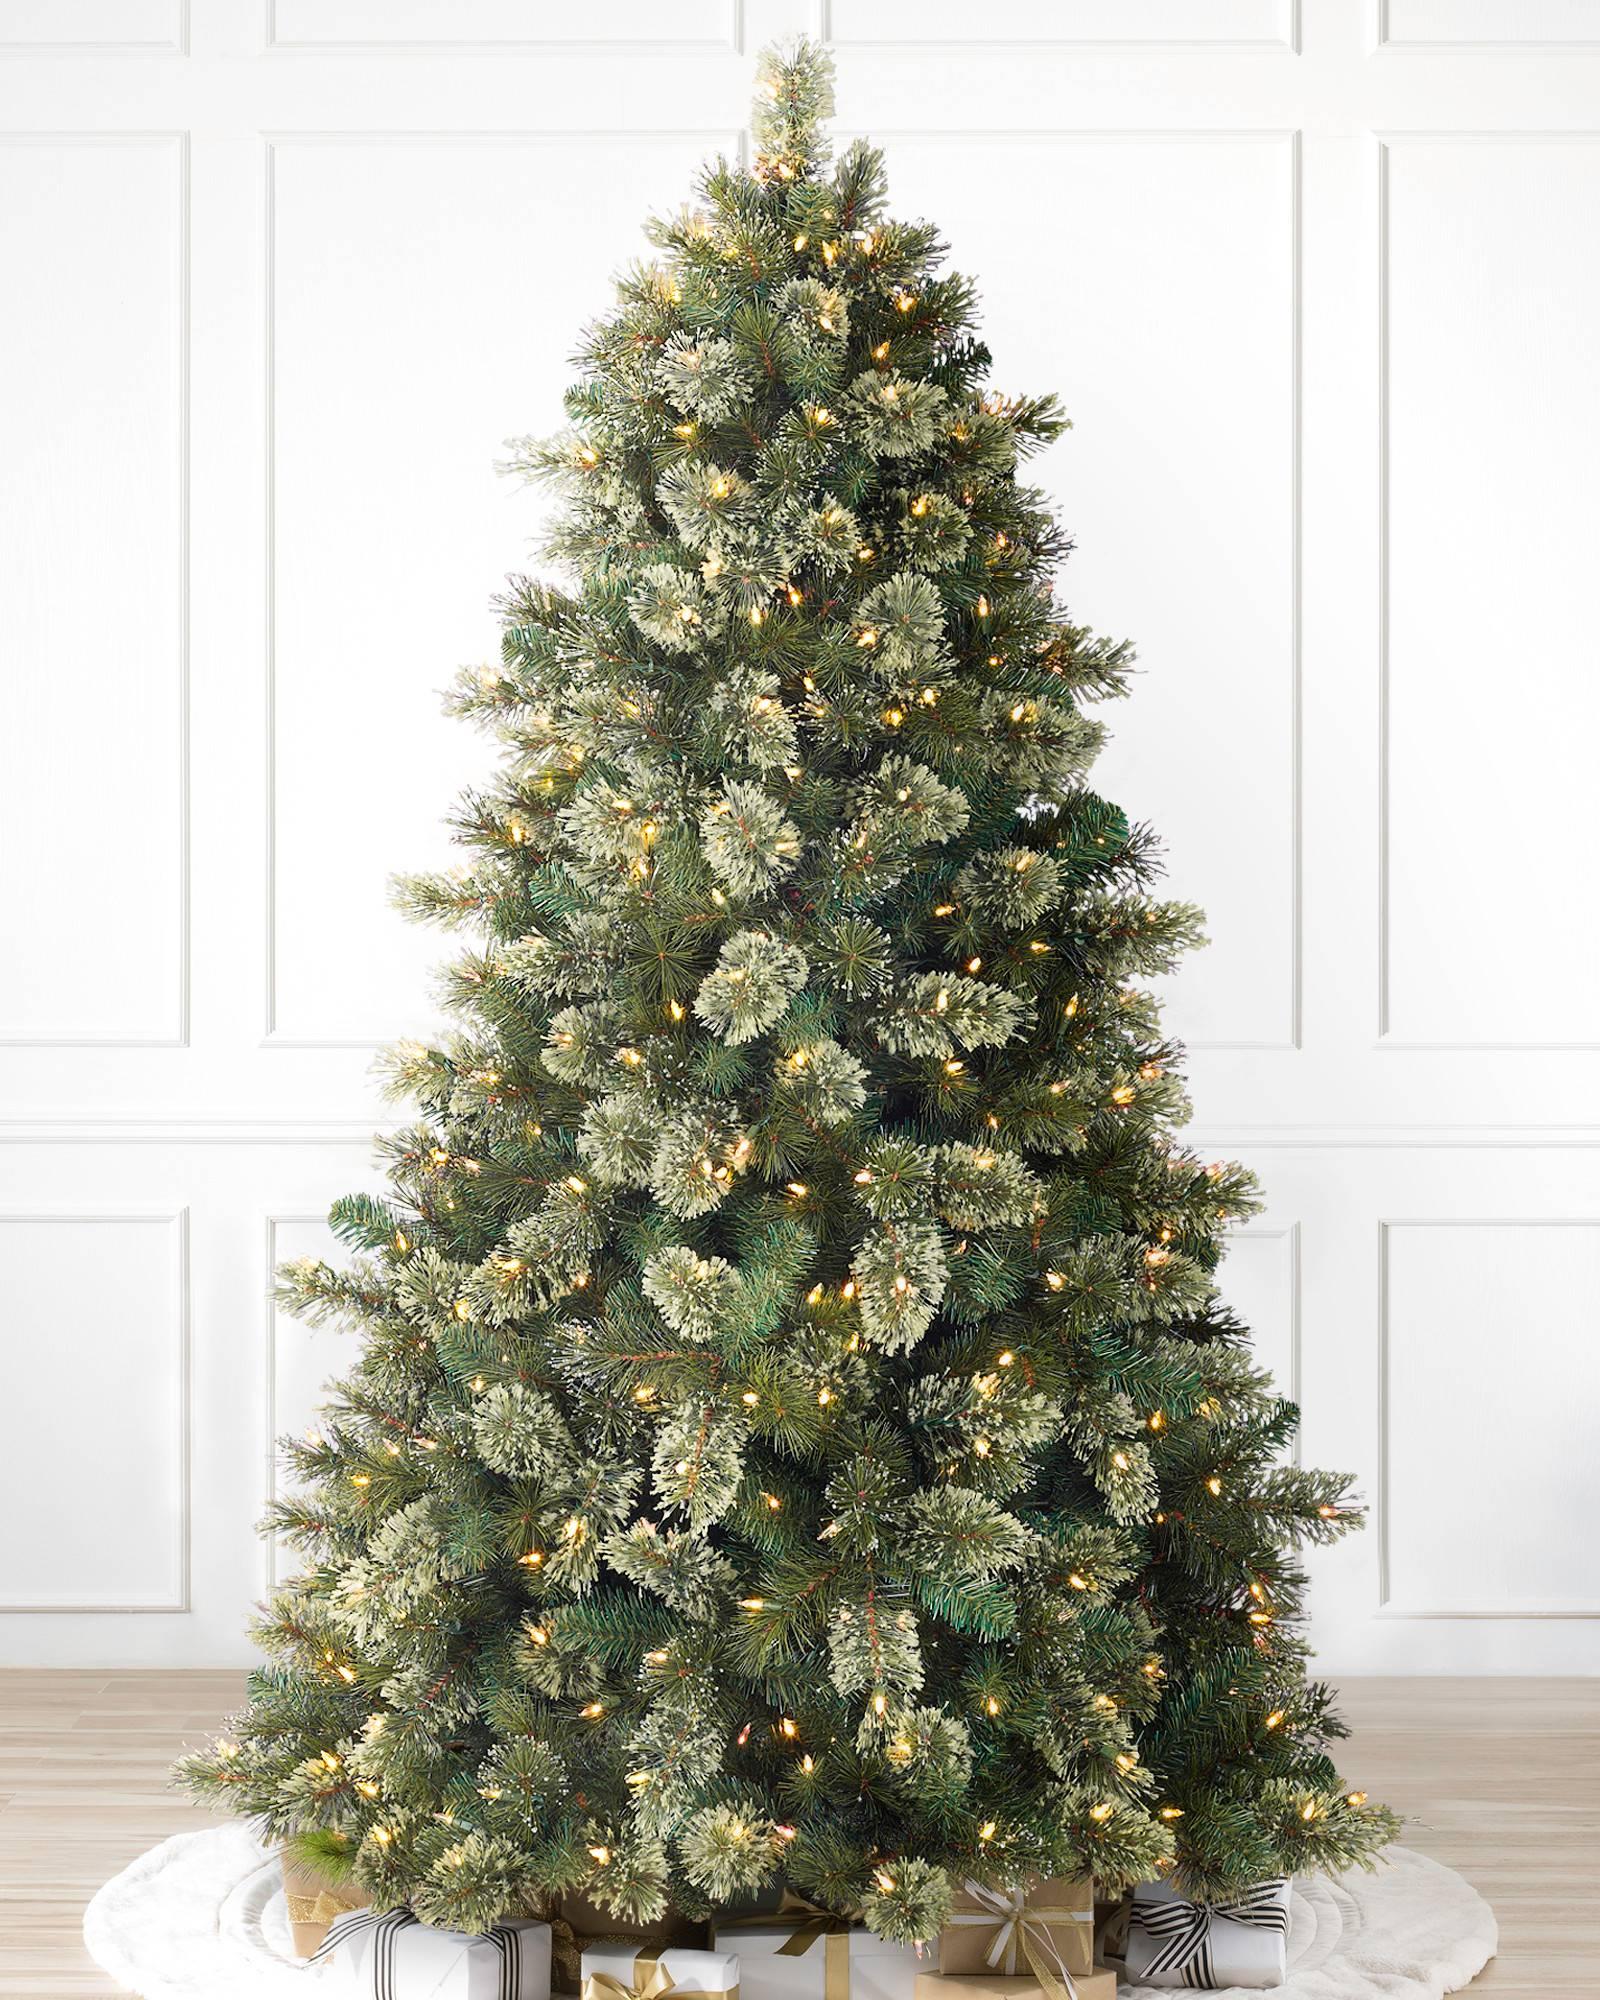 Christmas Tree Artificial.Scotch Hill Pine Artificial Christmas Tree Balsam Hill